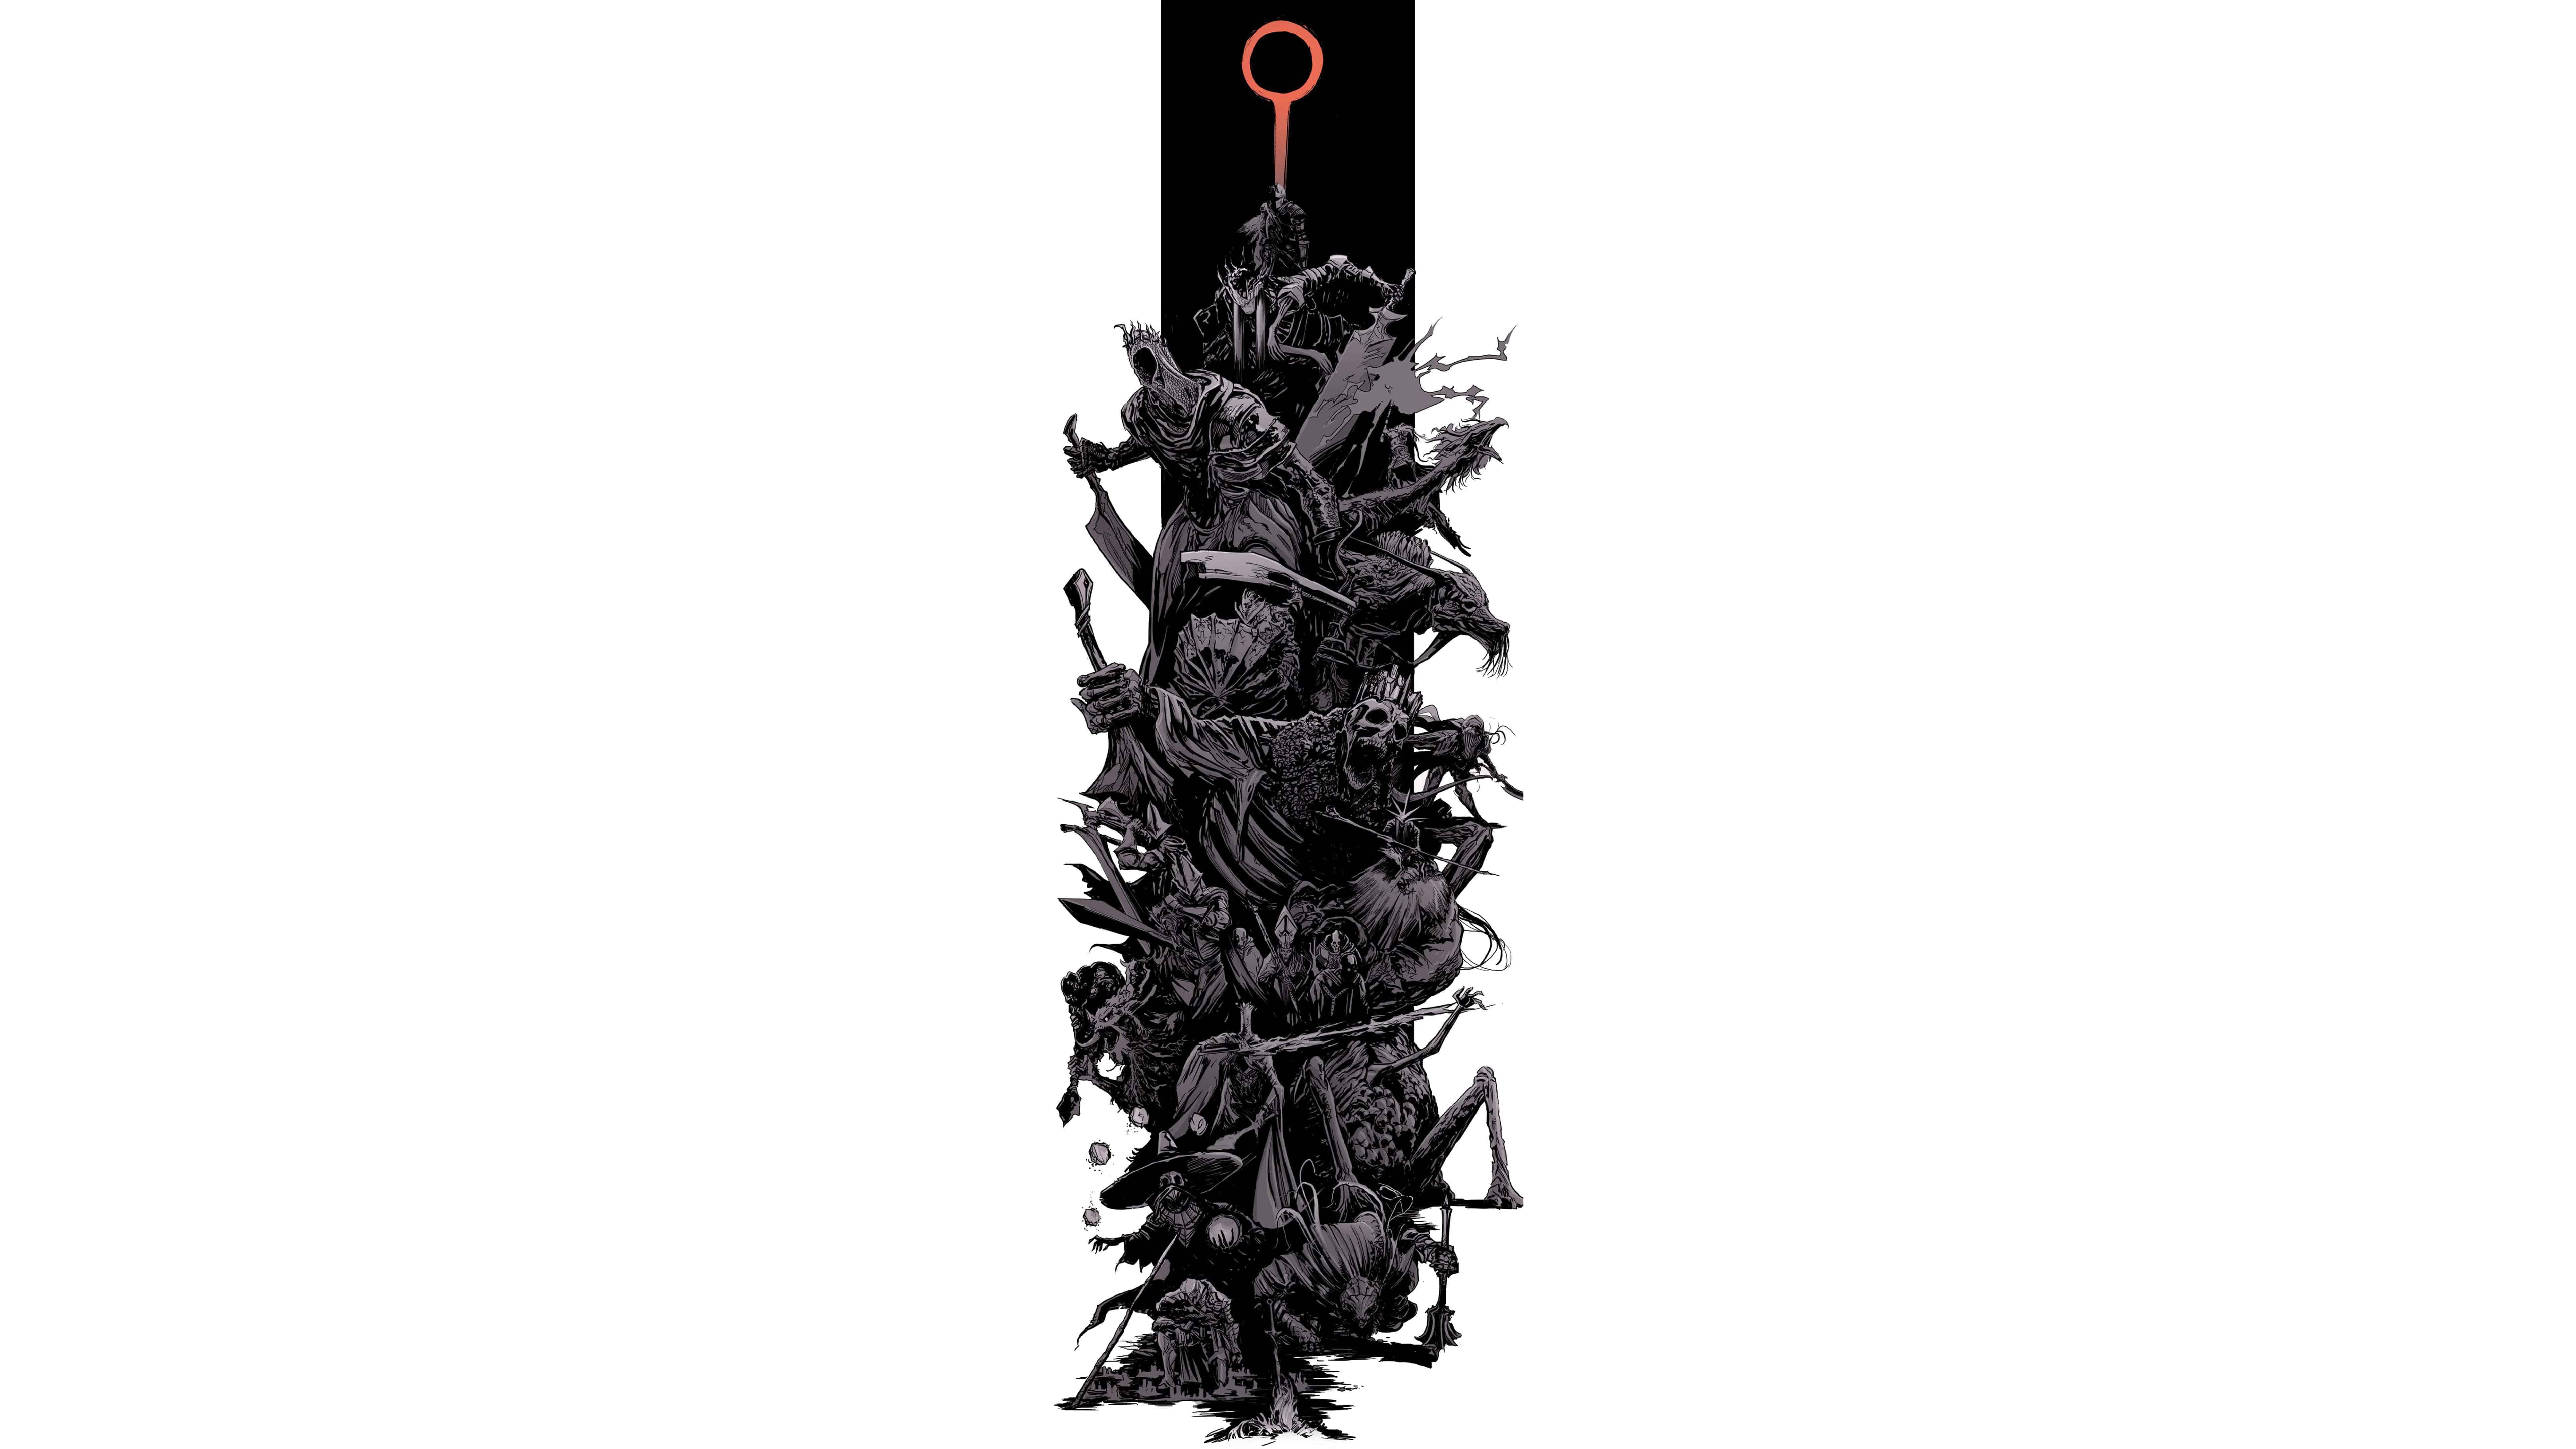 dark souls 3 bosses uhd 8k wallpaper